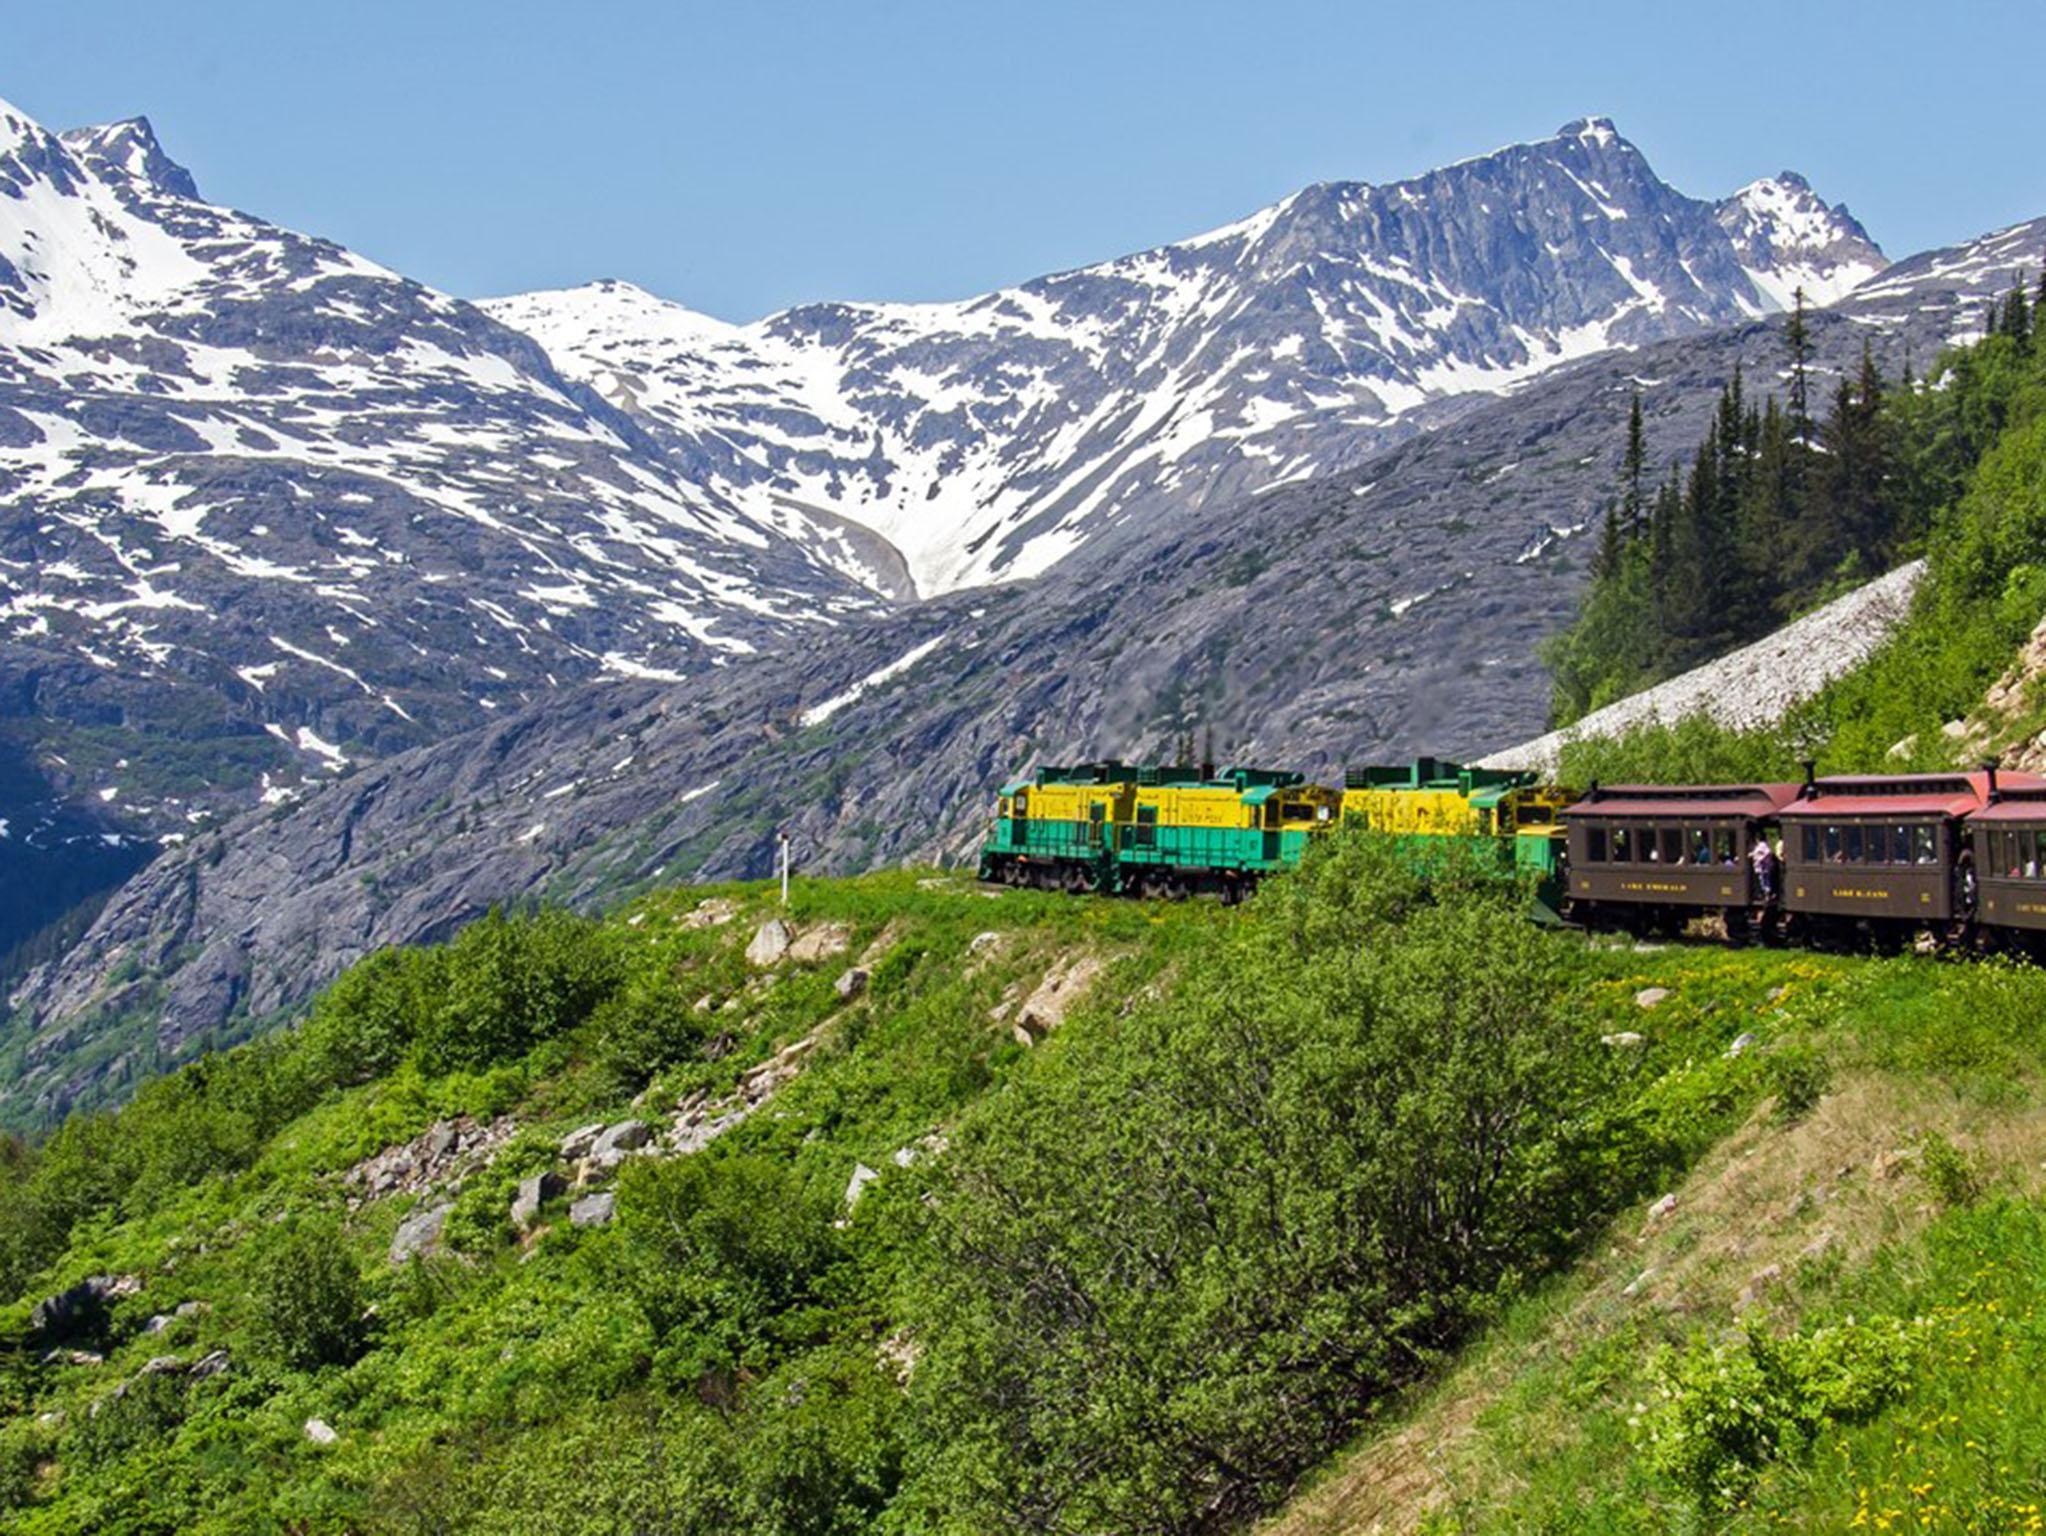 Taste Escape: On track for spectacular in Alaska | The Independentindependent_brand_ident_LOGOUntitled